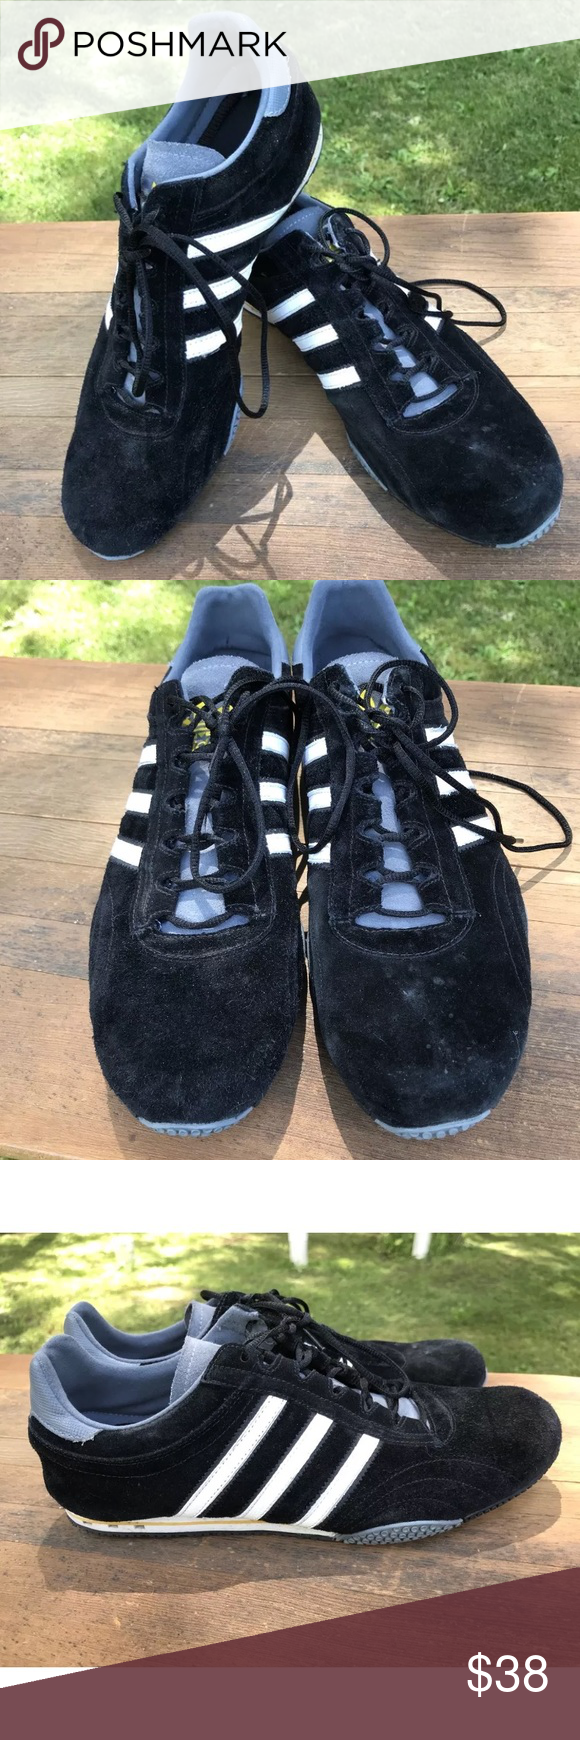 Adidas Zx Racer Mens Sneaker Size 12 Shoe Blue Black